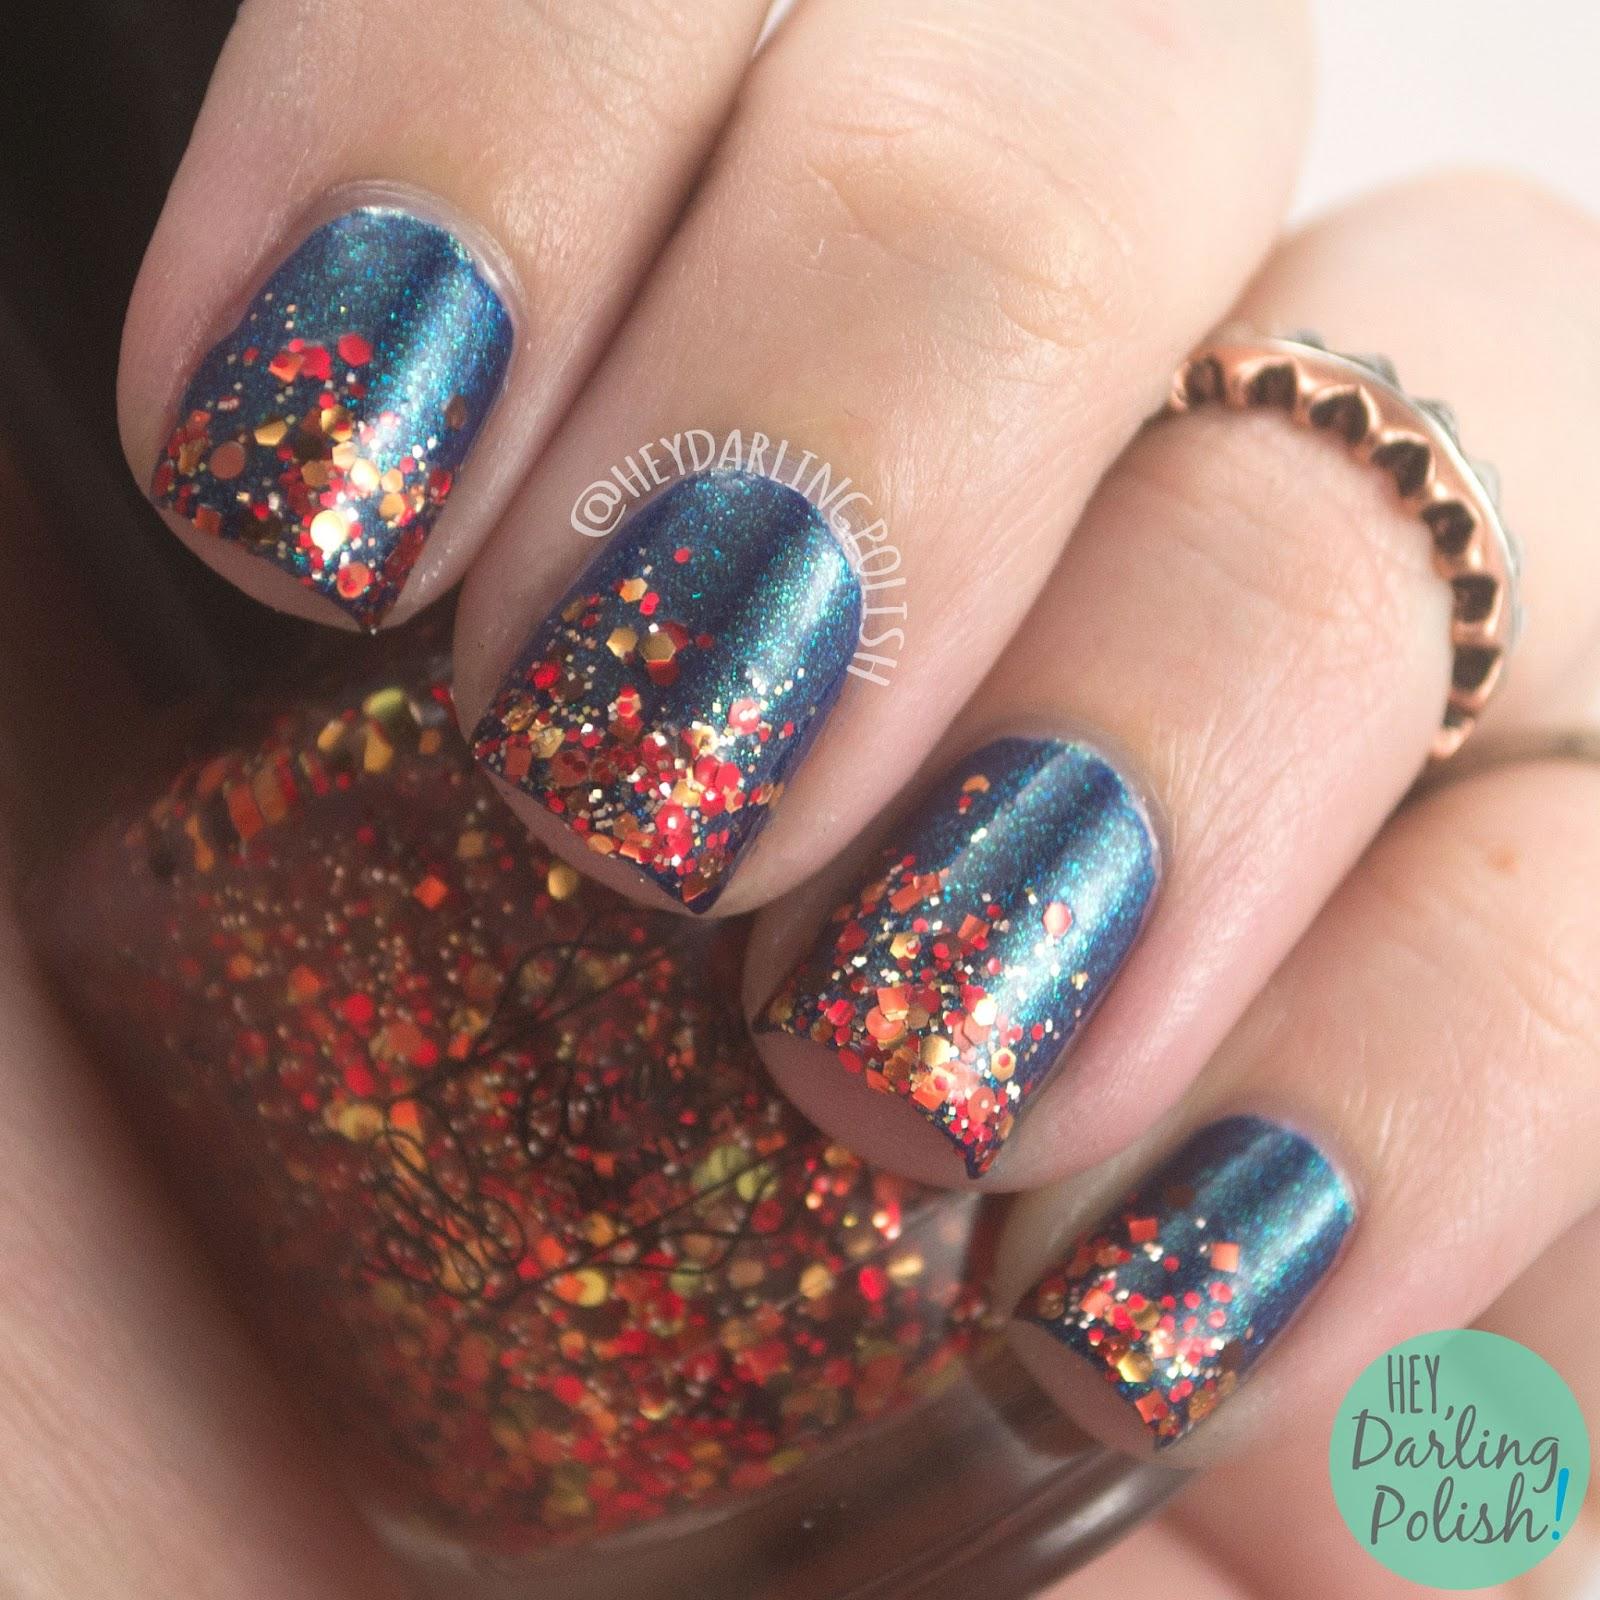 Hey, Darling Polish!: Hobby Polish Bloggers: November - Fall Favorites